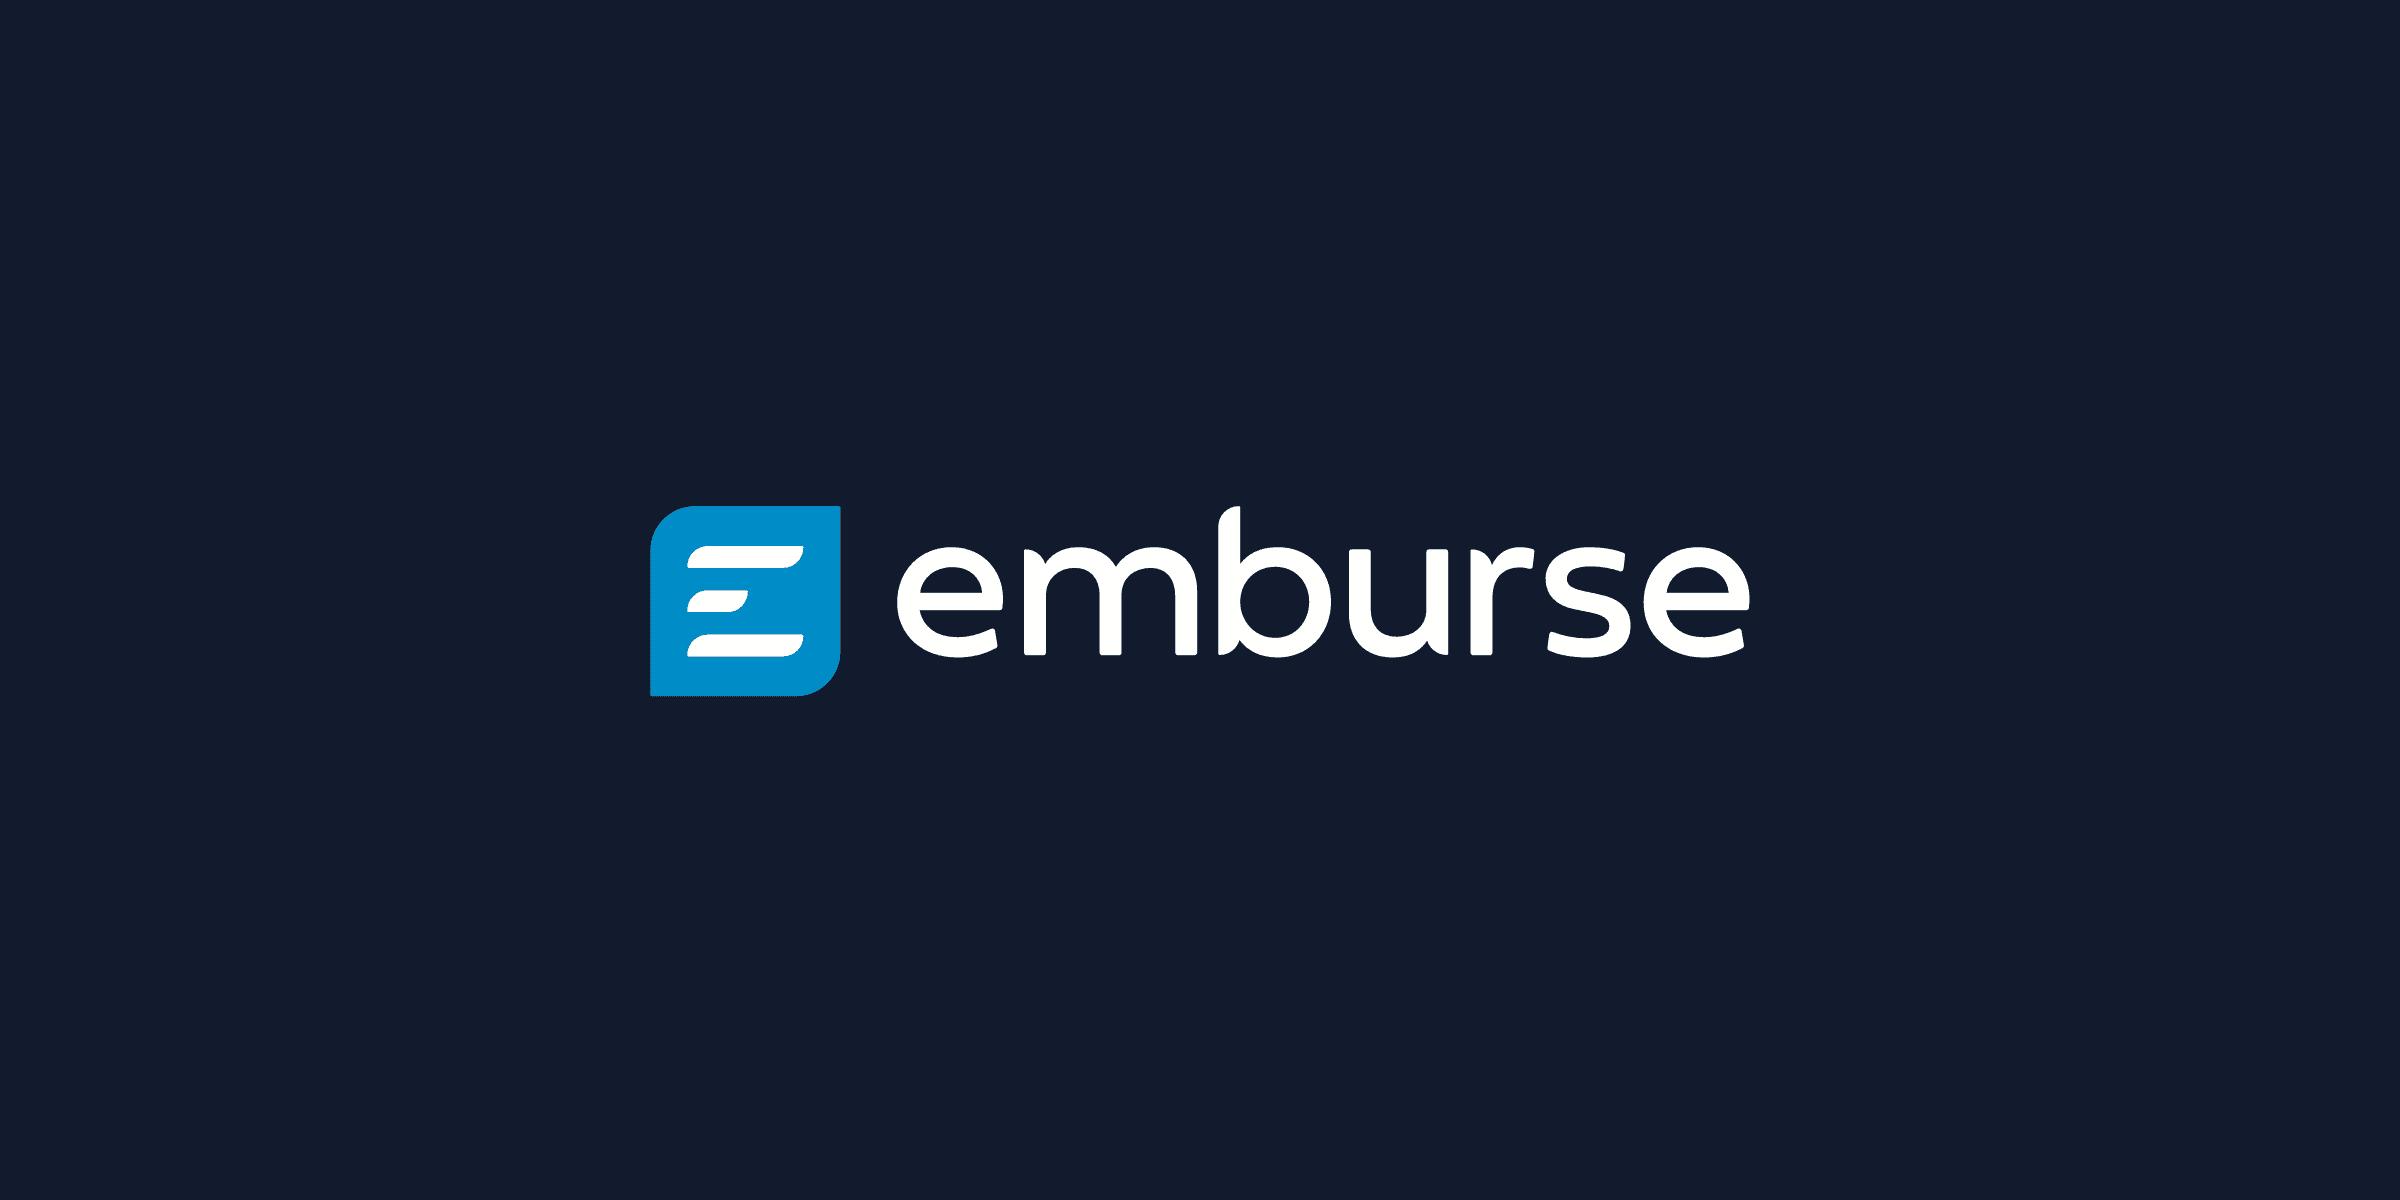 emburse-cover